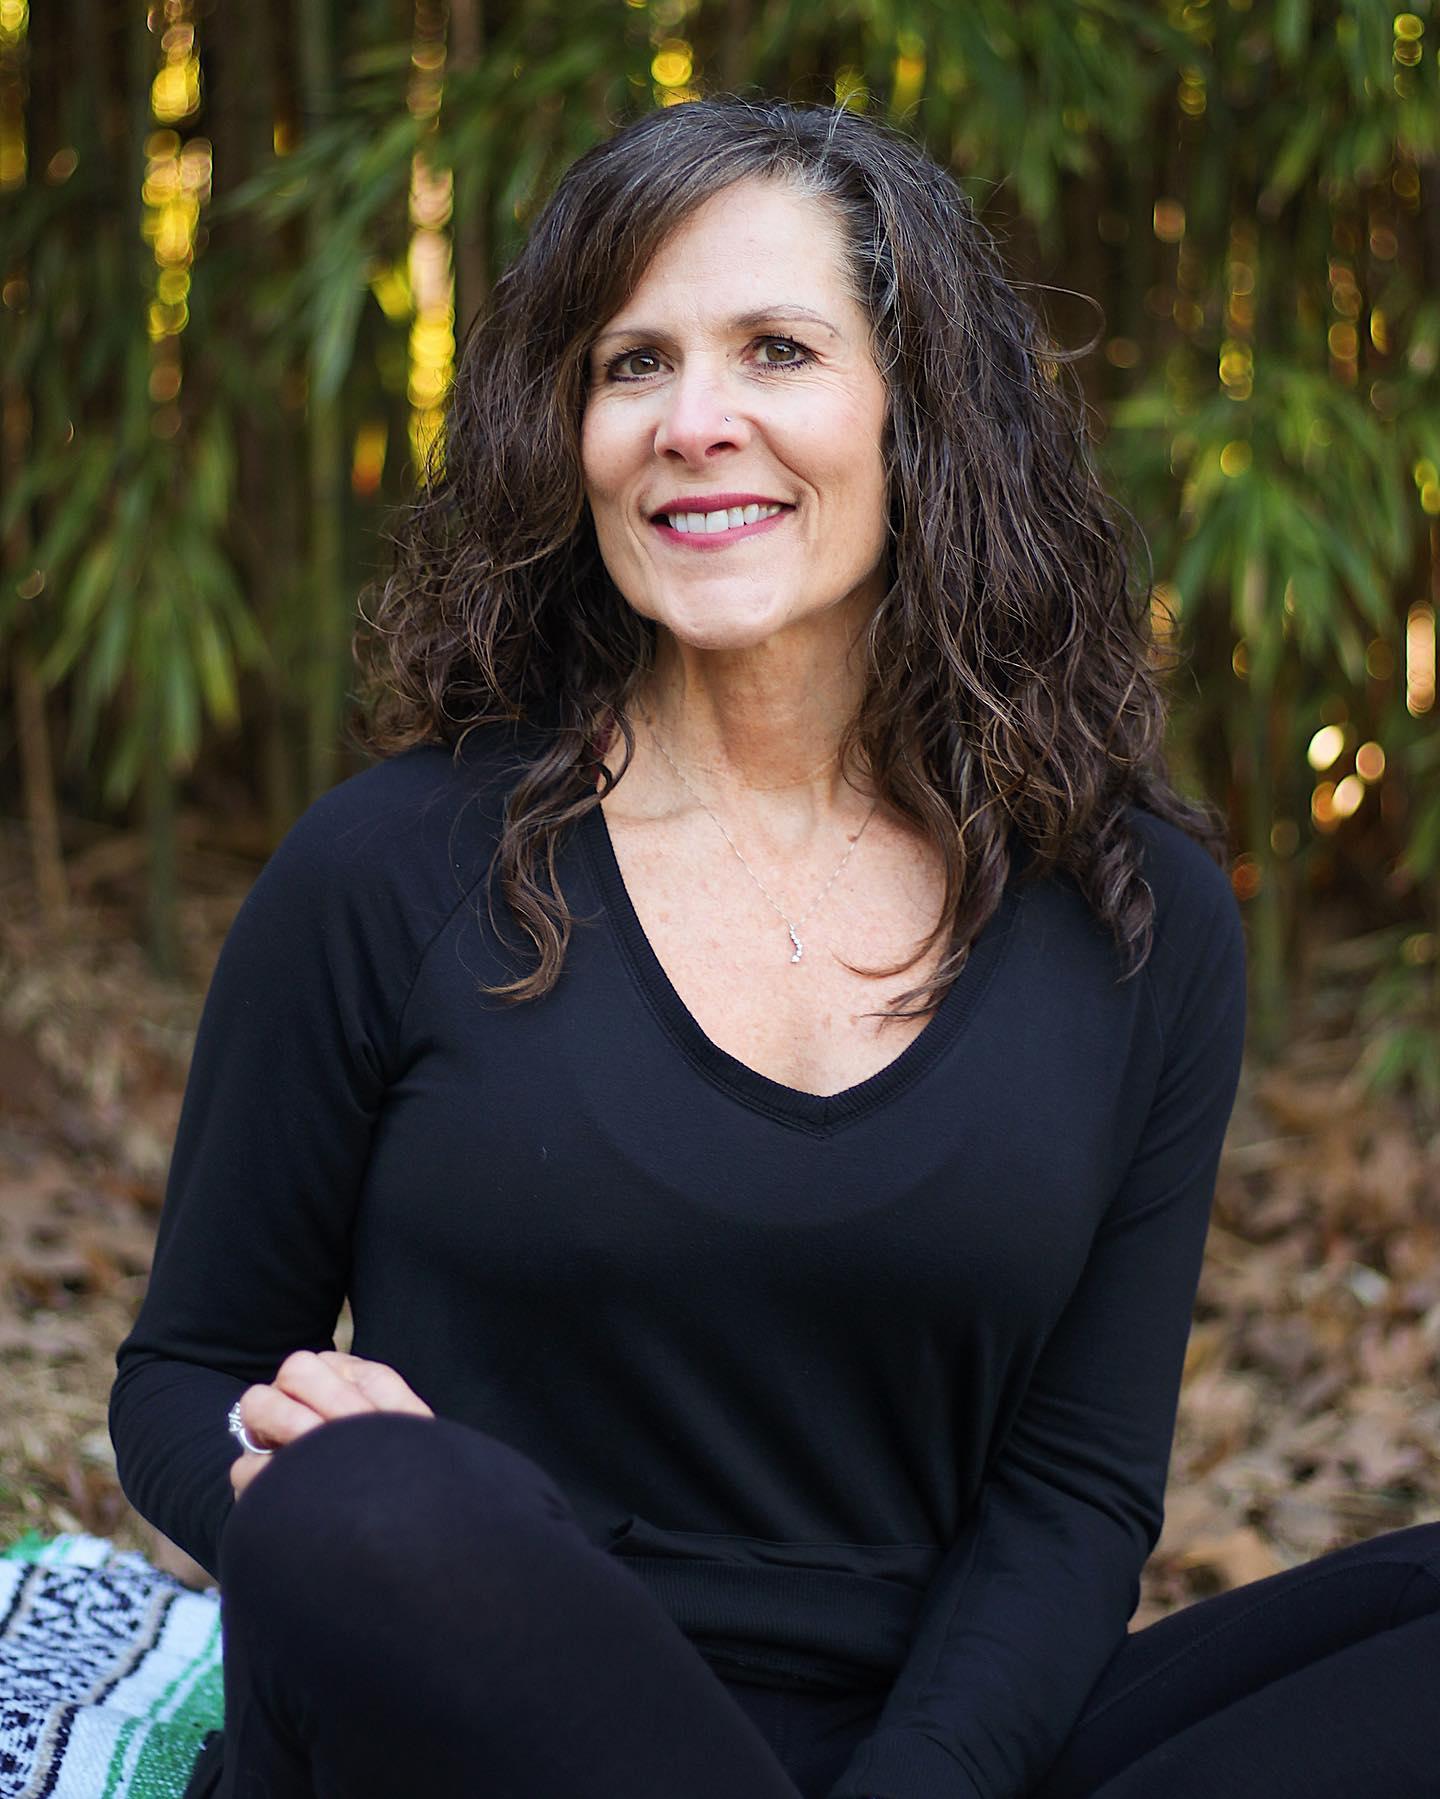 Stephanie Eddleman